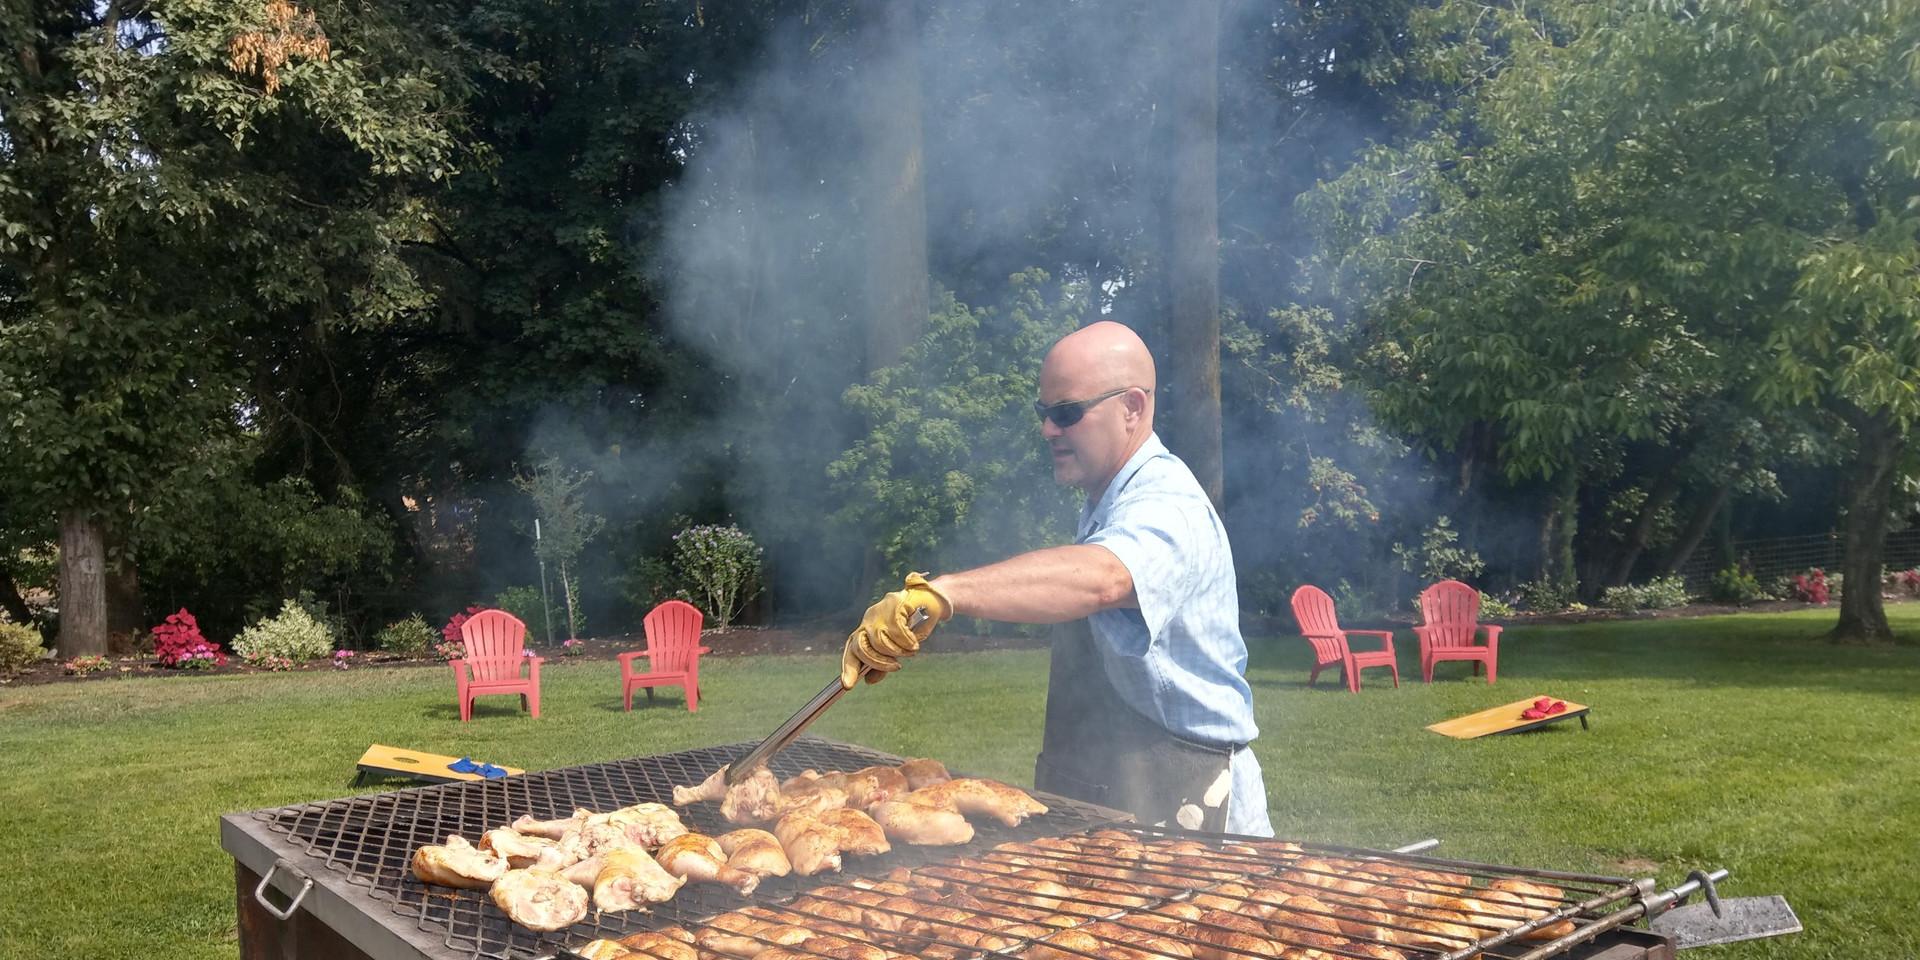 Reg grilling on large BBQ Pit